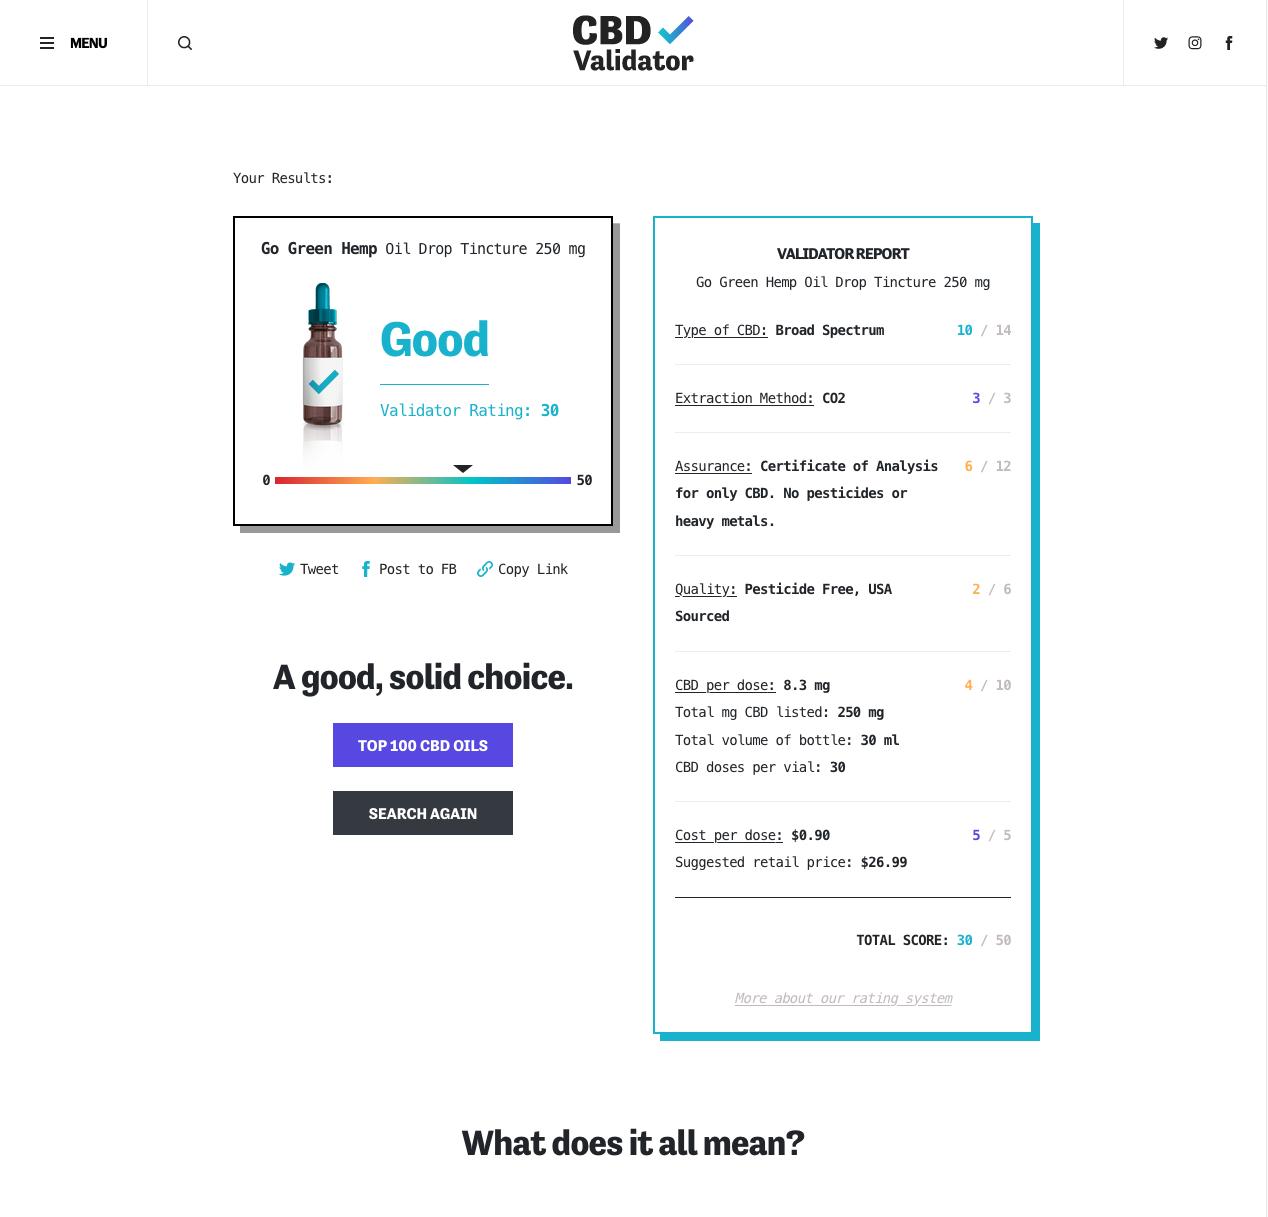 CBD Validator